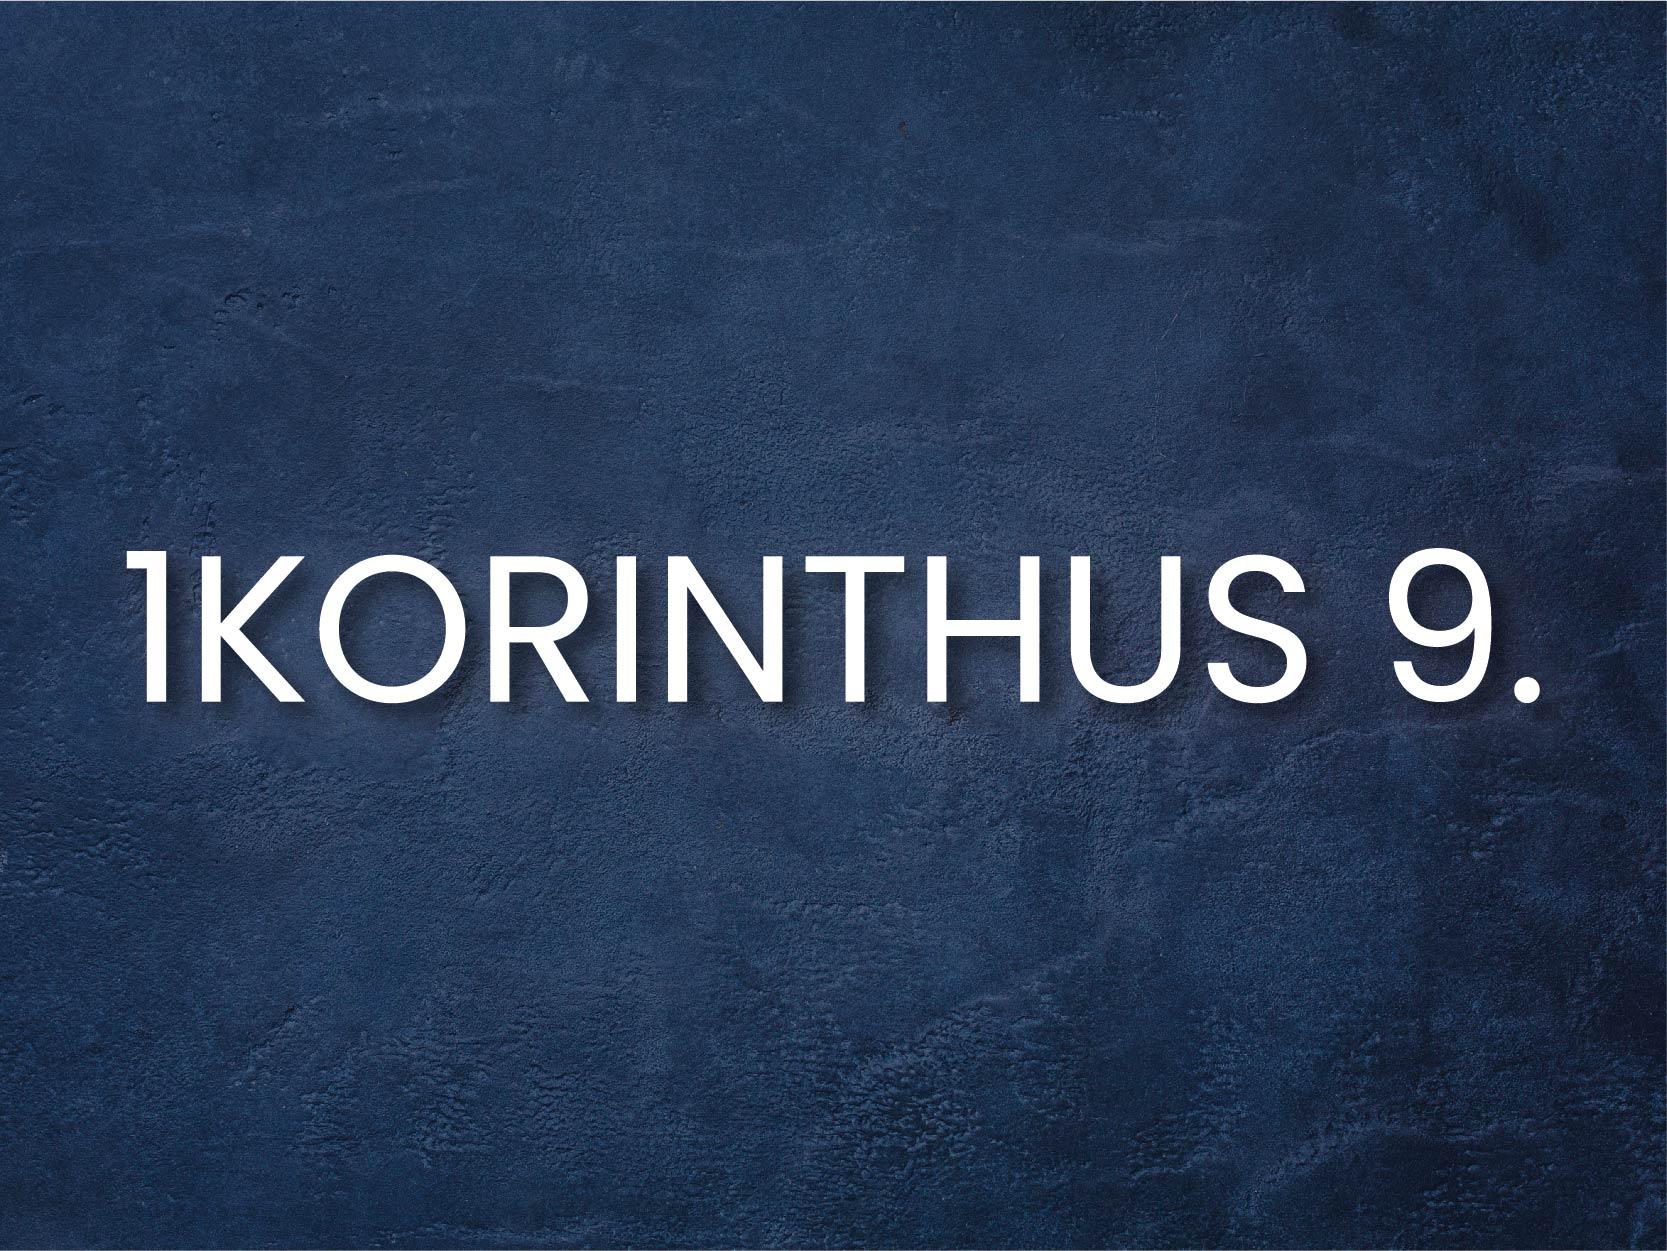 INFO_korinthus_9